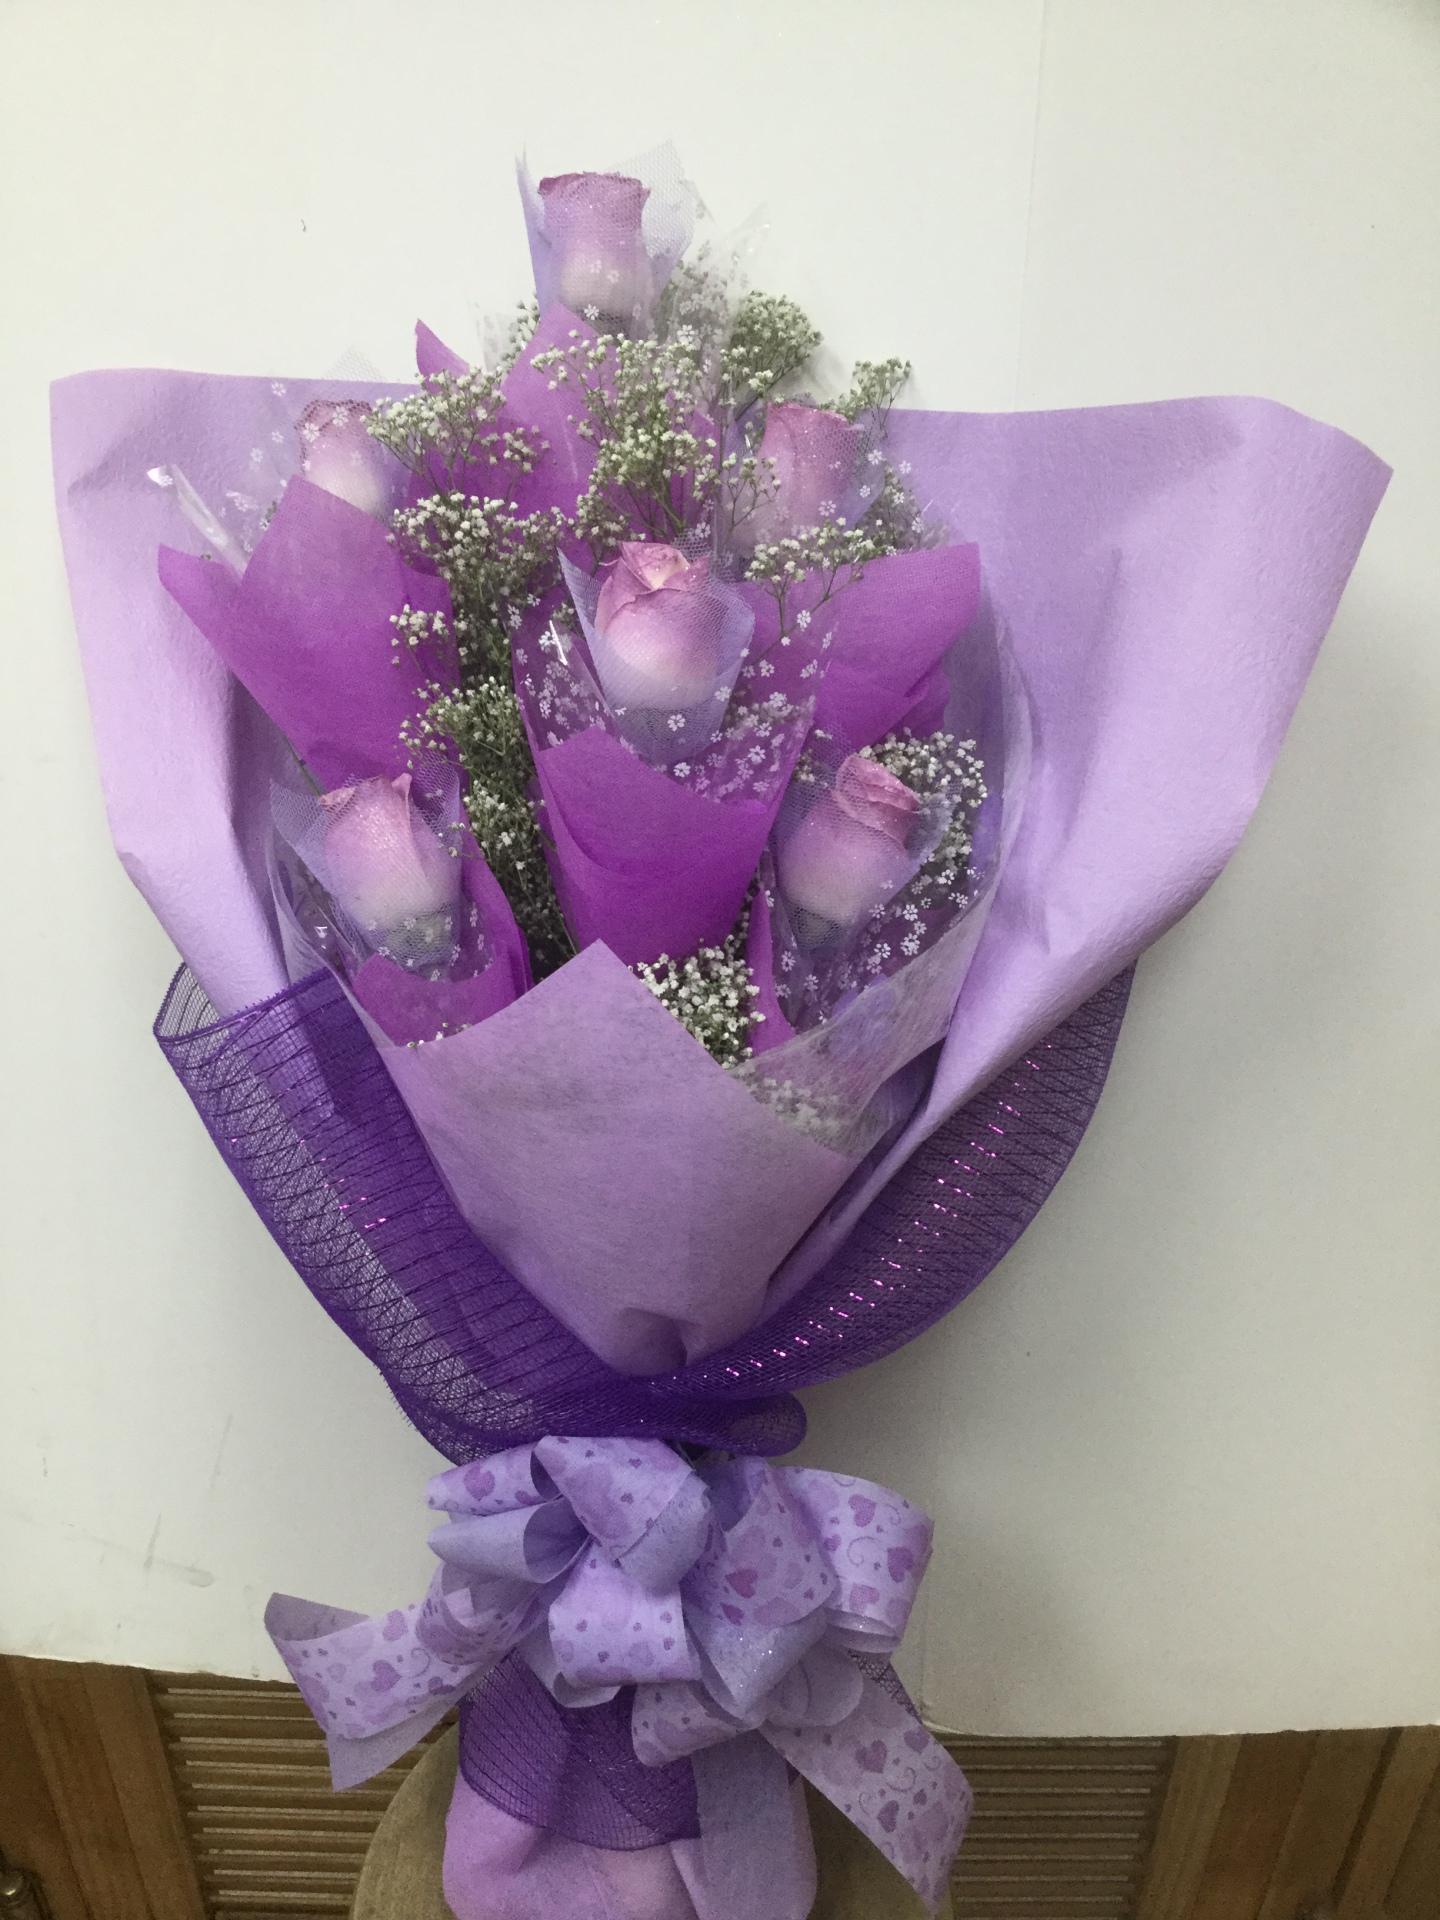 Half Dozen Tinted Roses - Flat HK Wrap Bouquet